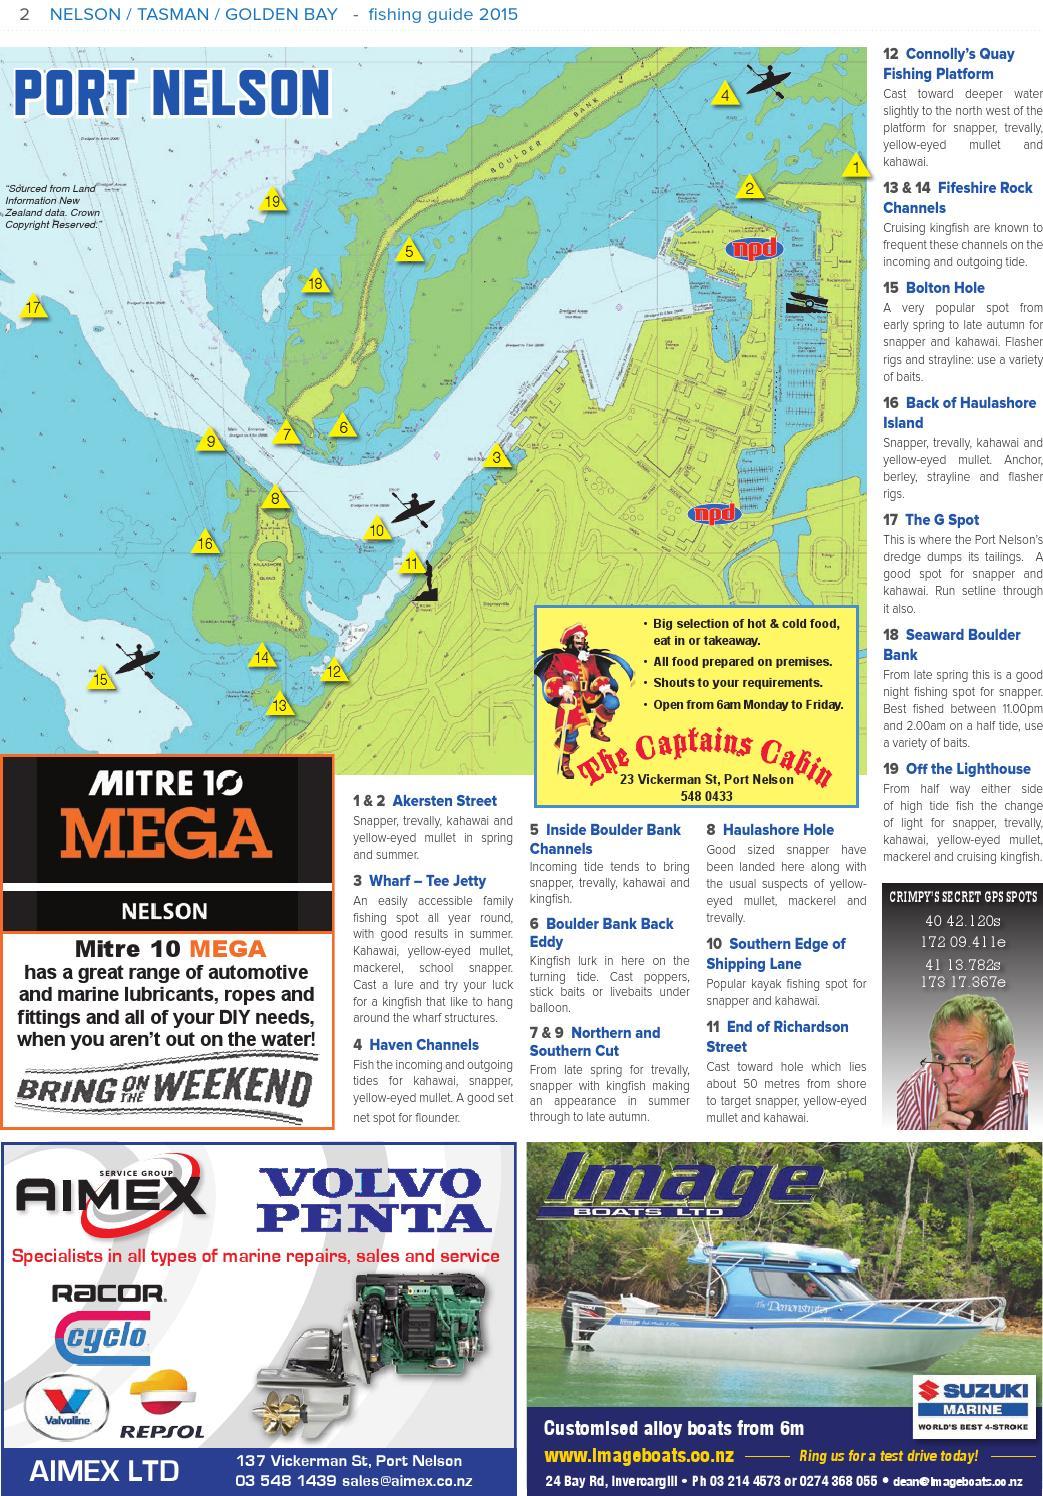 Fishing Guide - Nelson Tasman Golden Bay by The Fishing